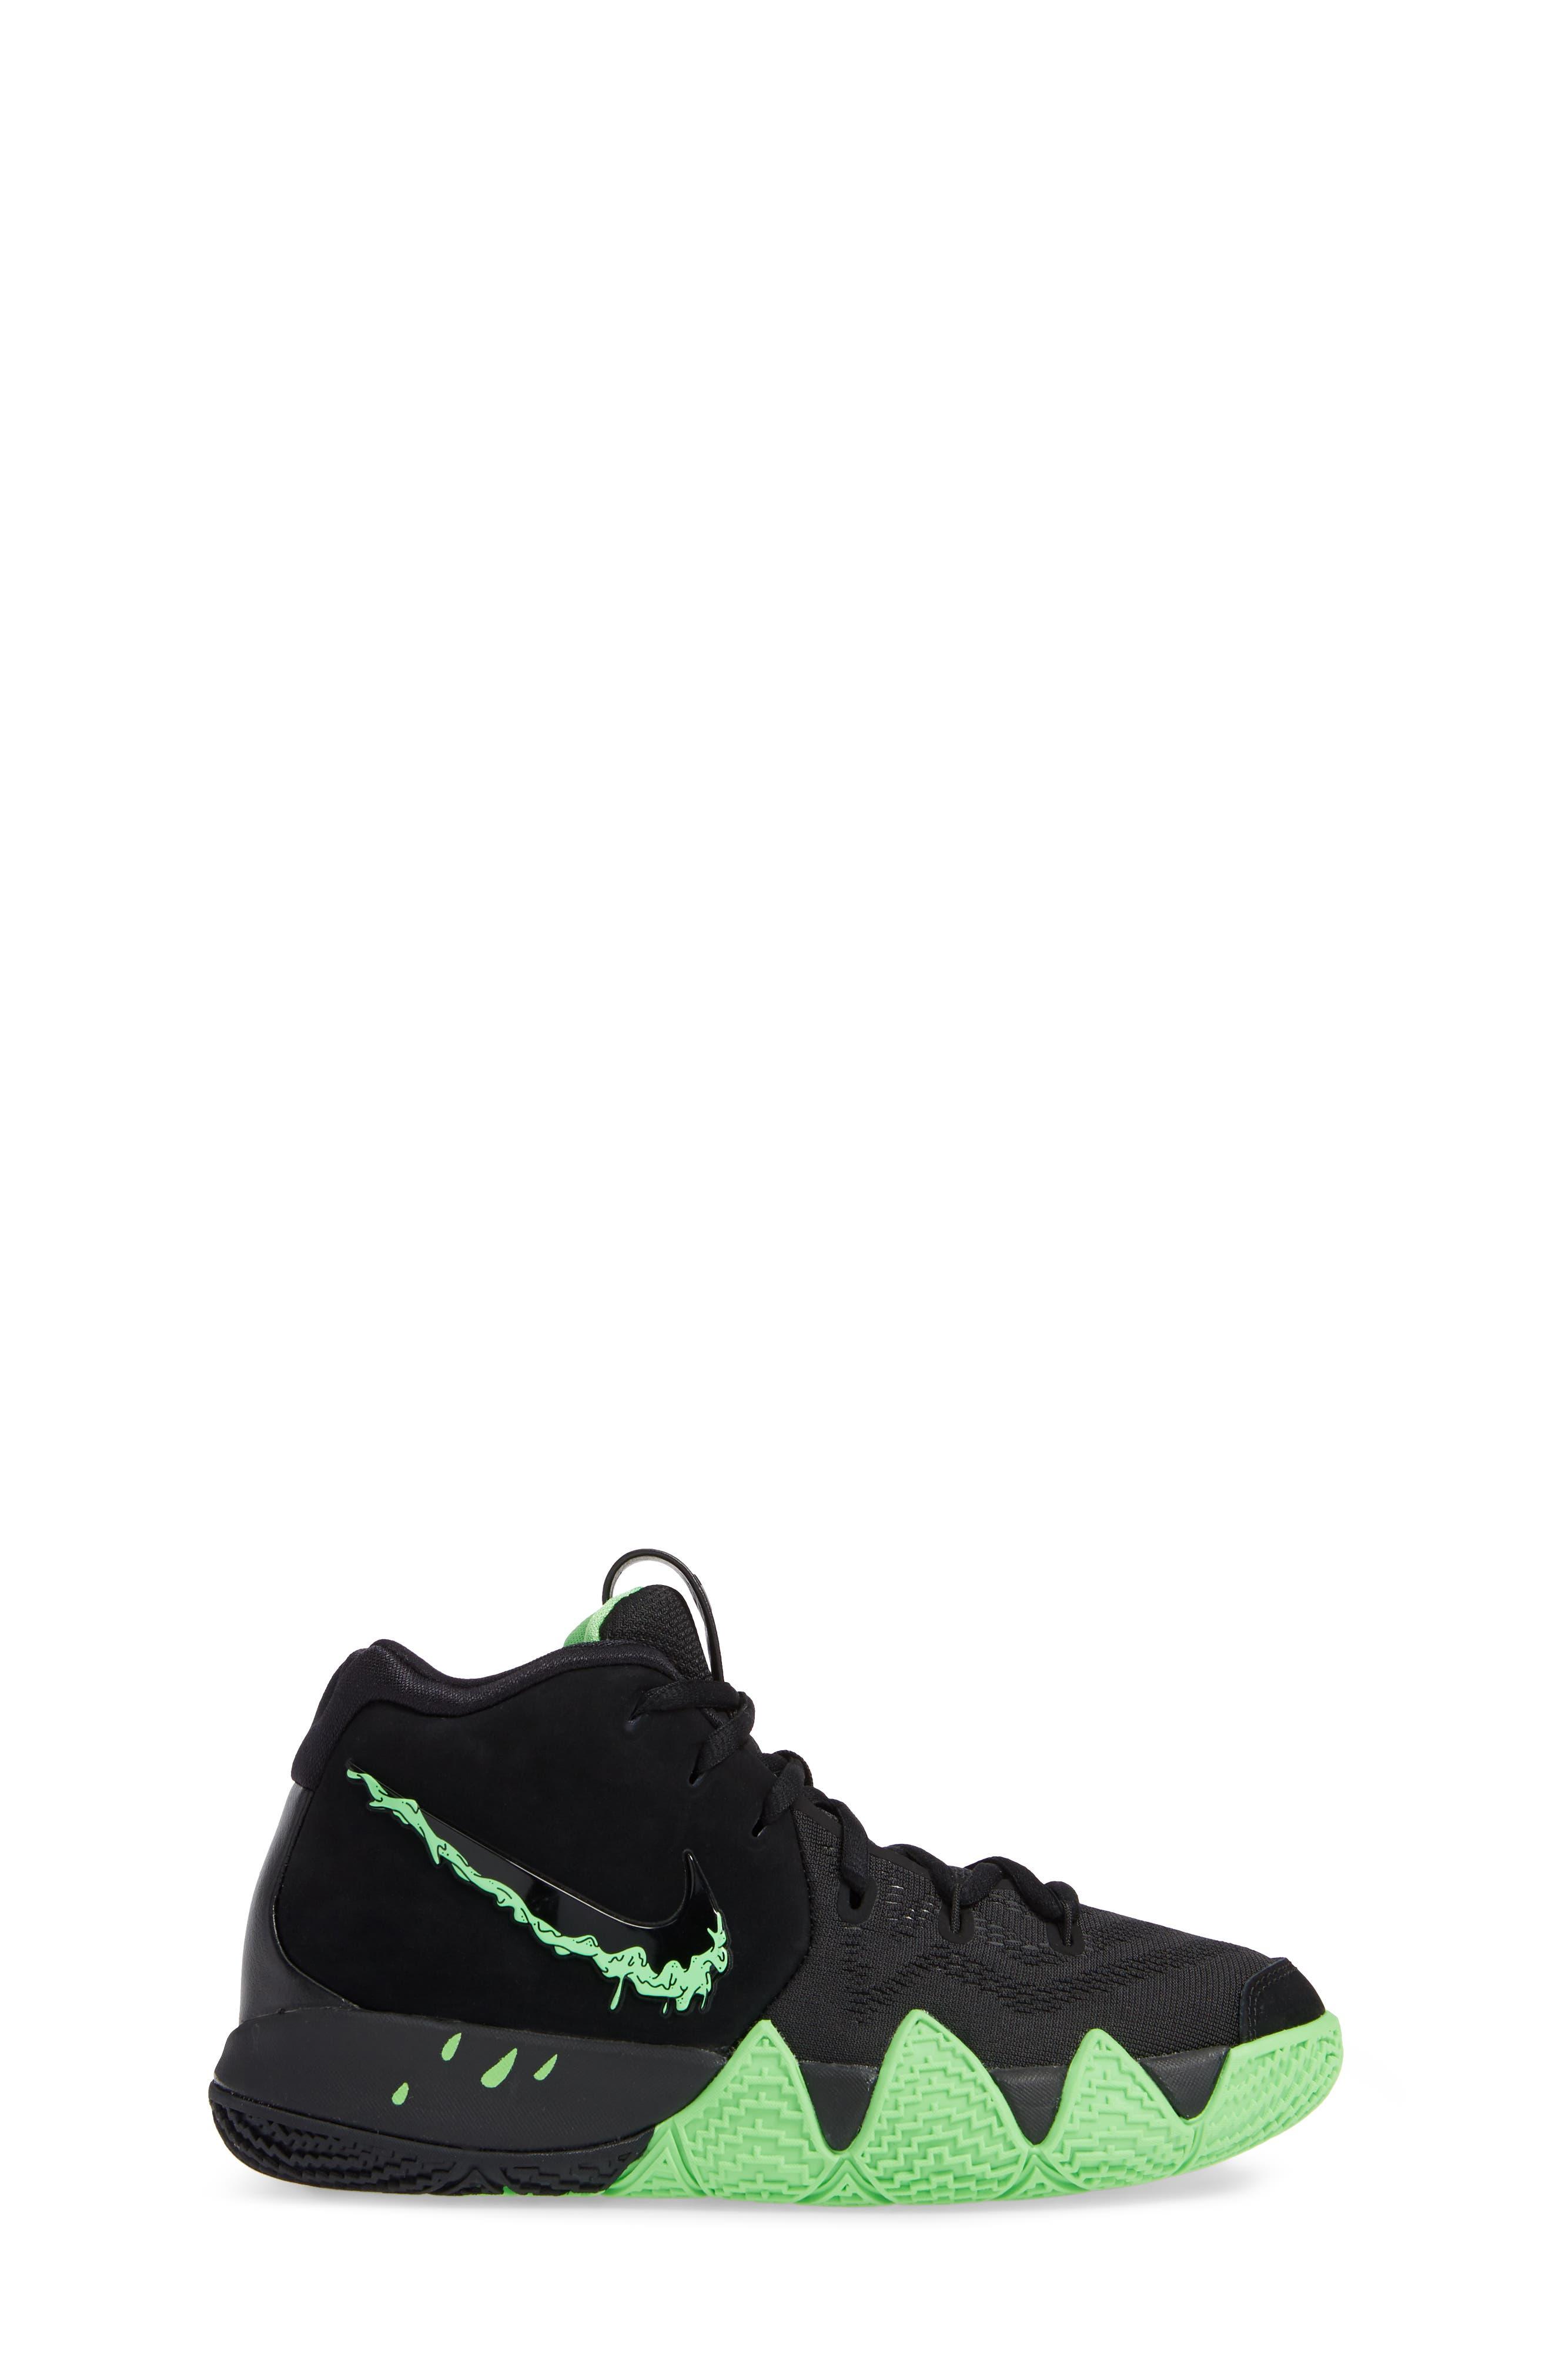 Kyrie 4 Basketball Shoe,                             Alternate thumbnail 3, color,                             BLACK/ RAGE GREEN